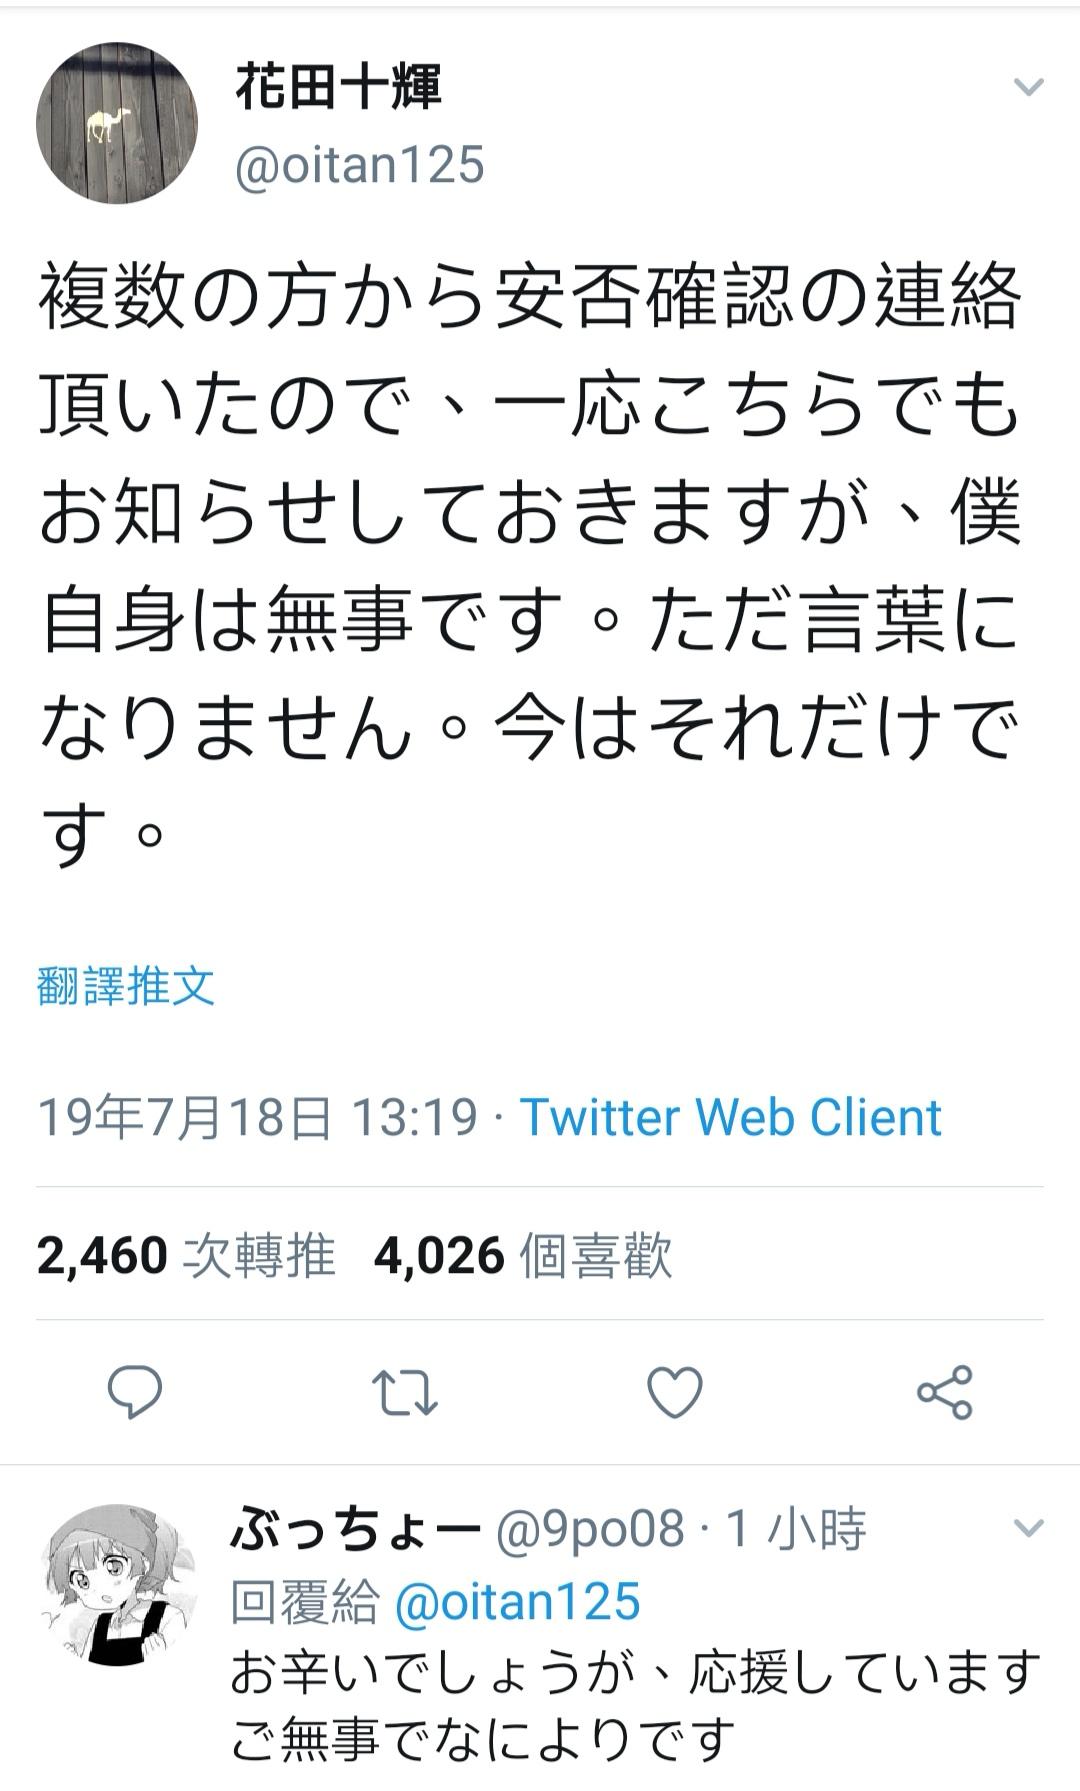 https://upload.cc/i1/2019/07/18/E9ZBD2.jpg